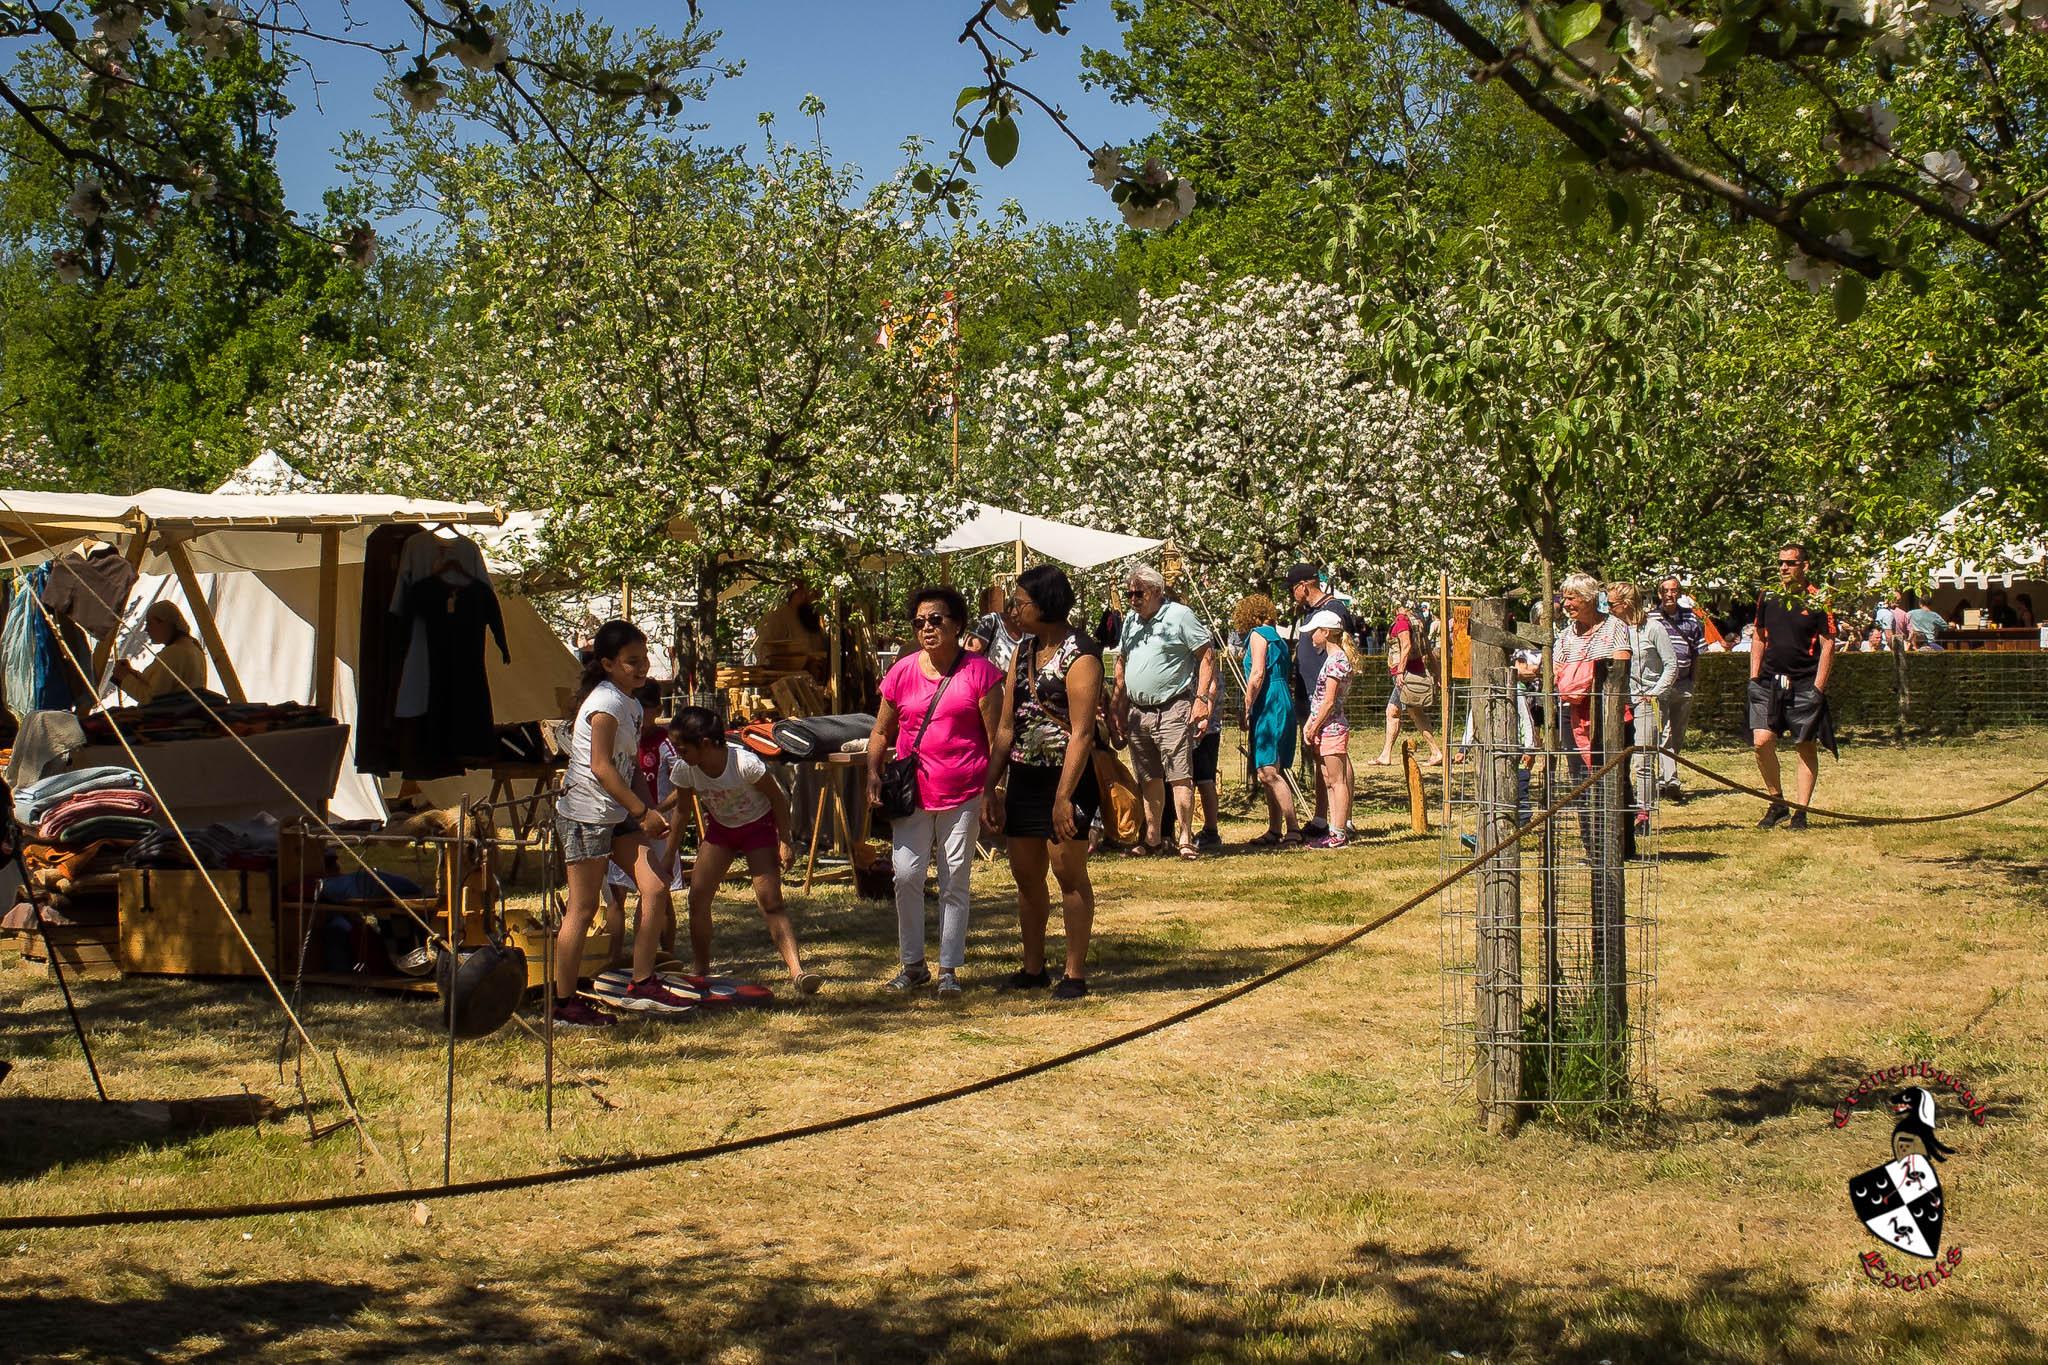 Middeleeuws-Festijn-Cannenburgh-2018-Algemeen-Ellen-la-Faille-33